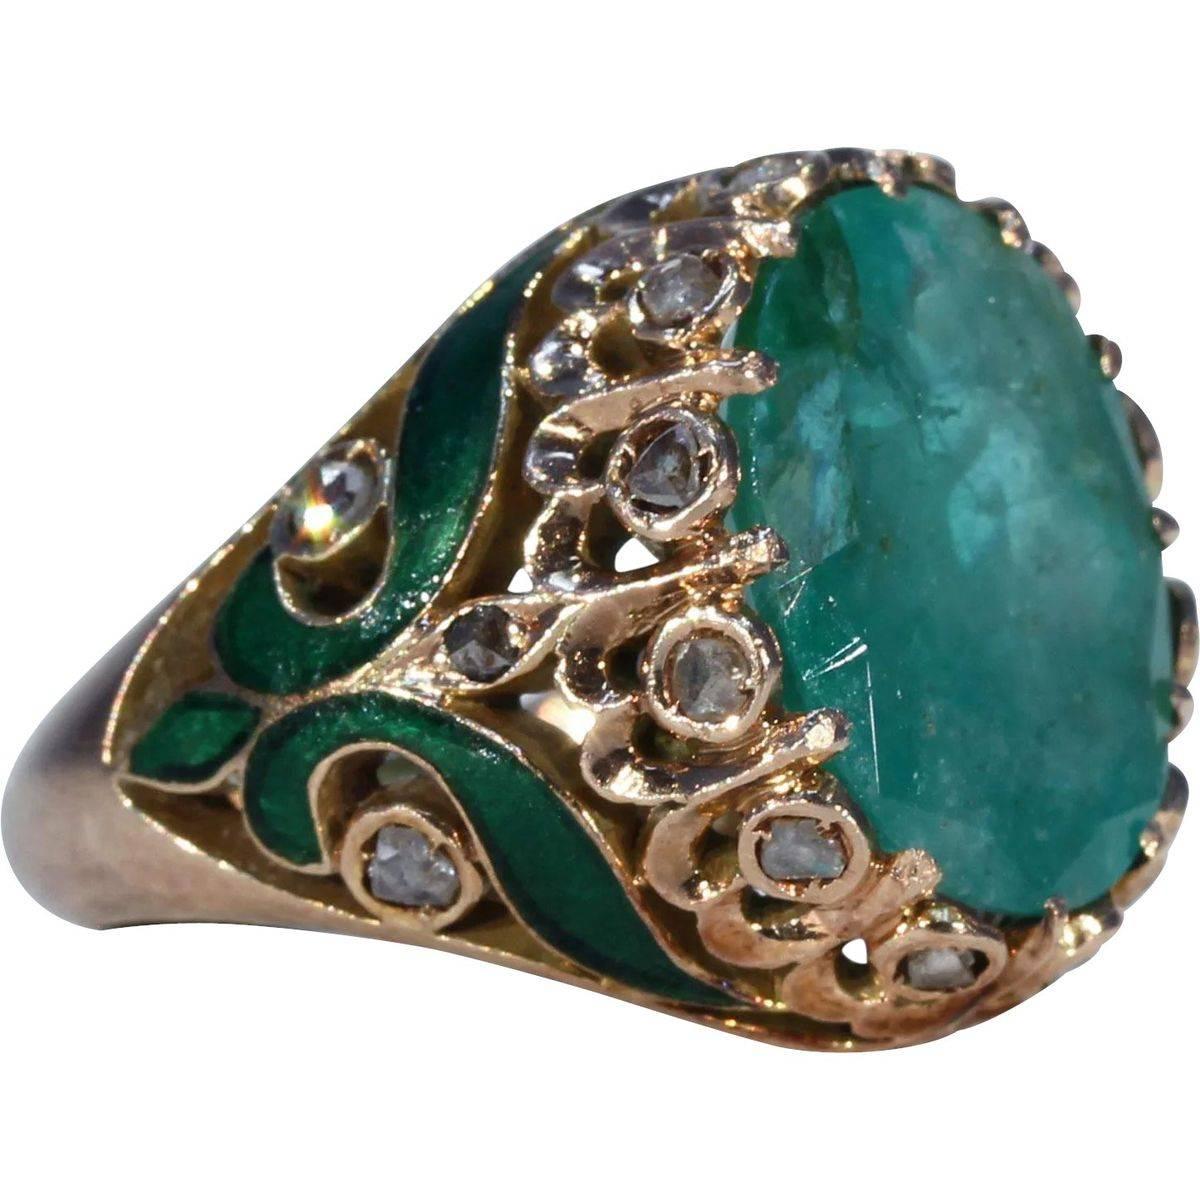 Art deco jewelry-130111876720556834